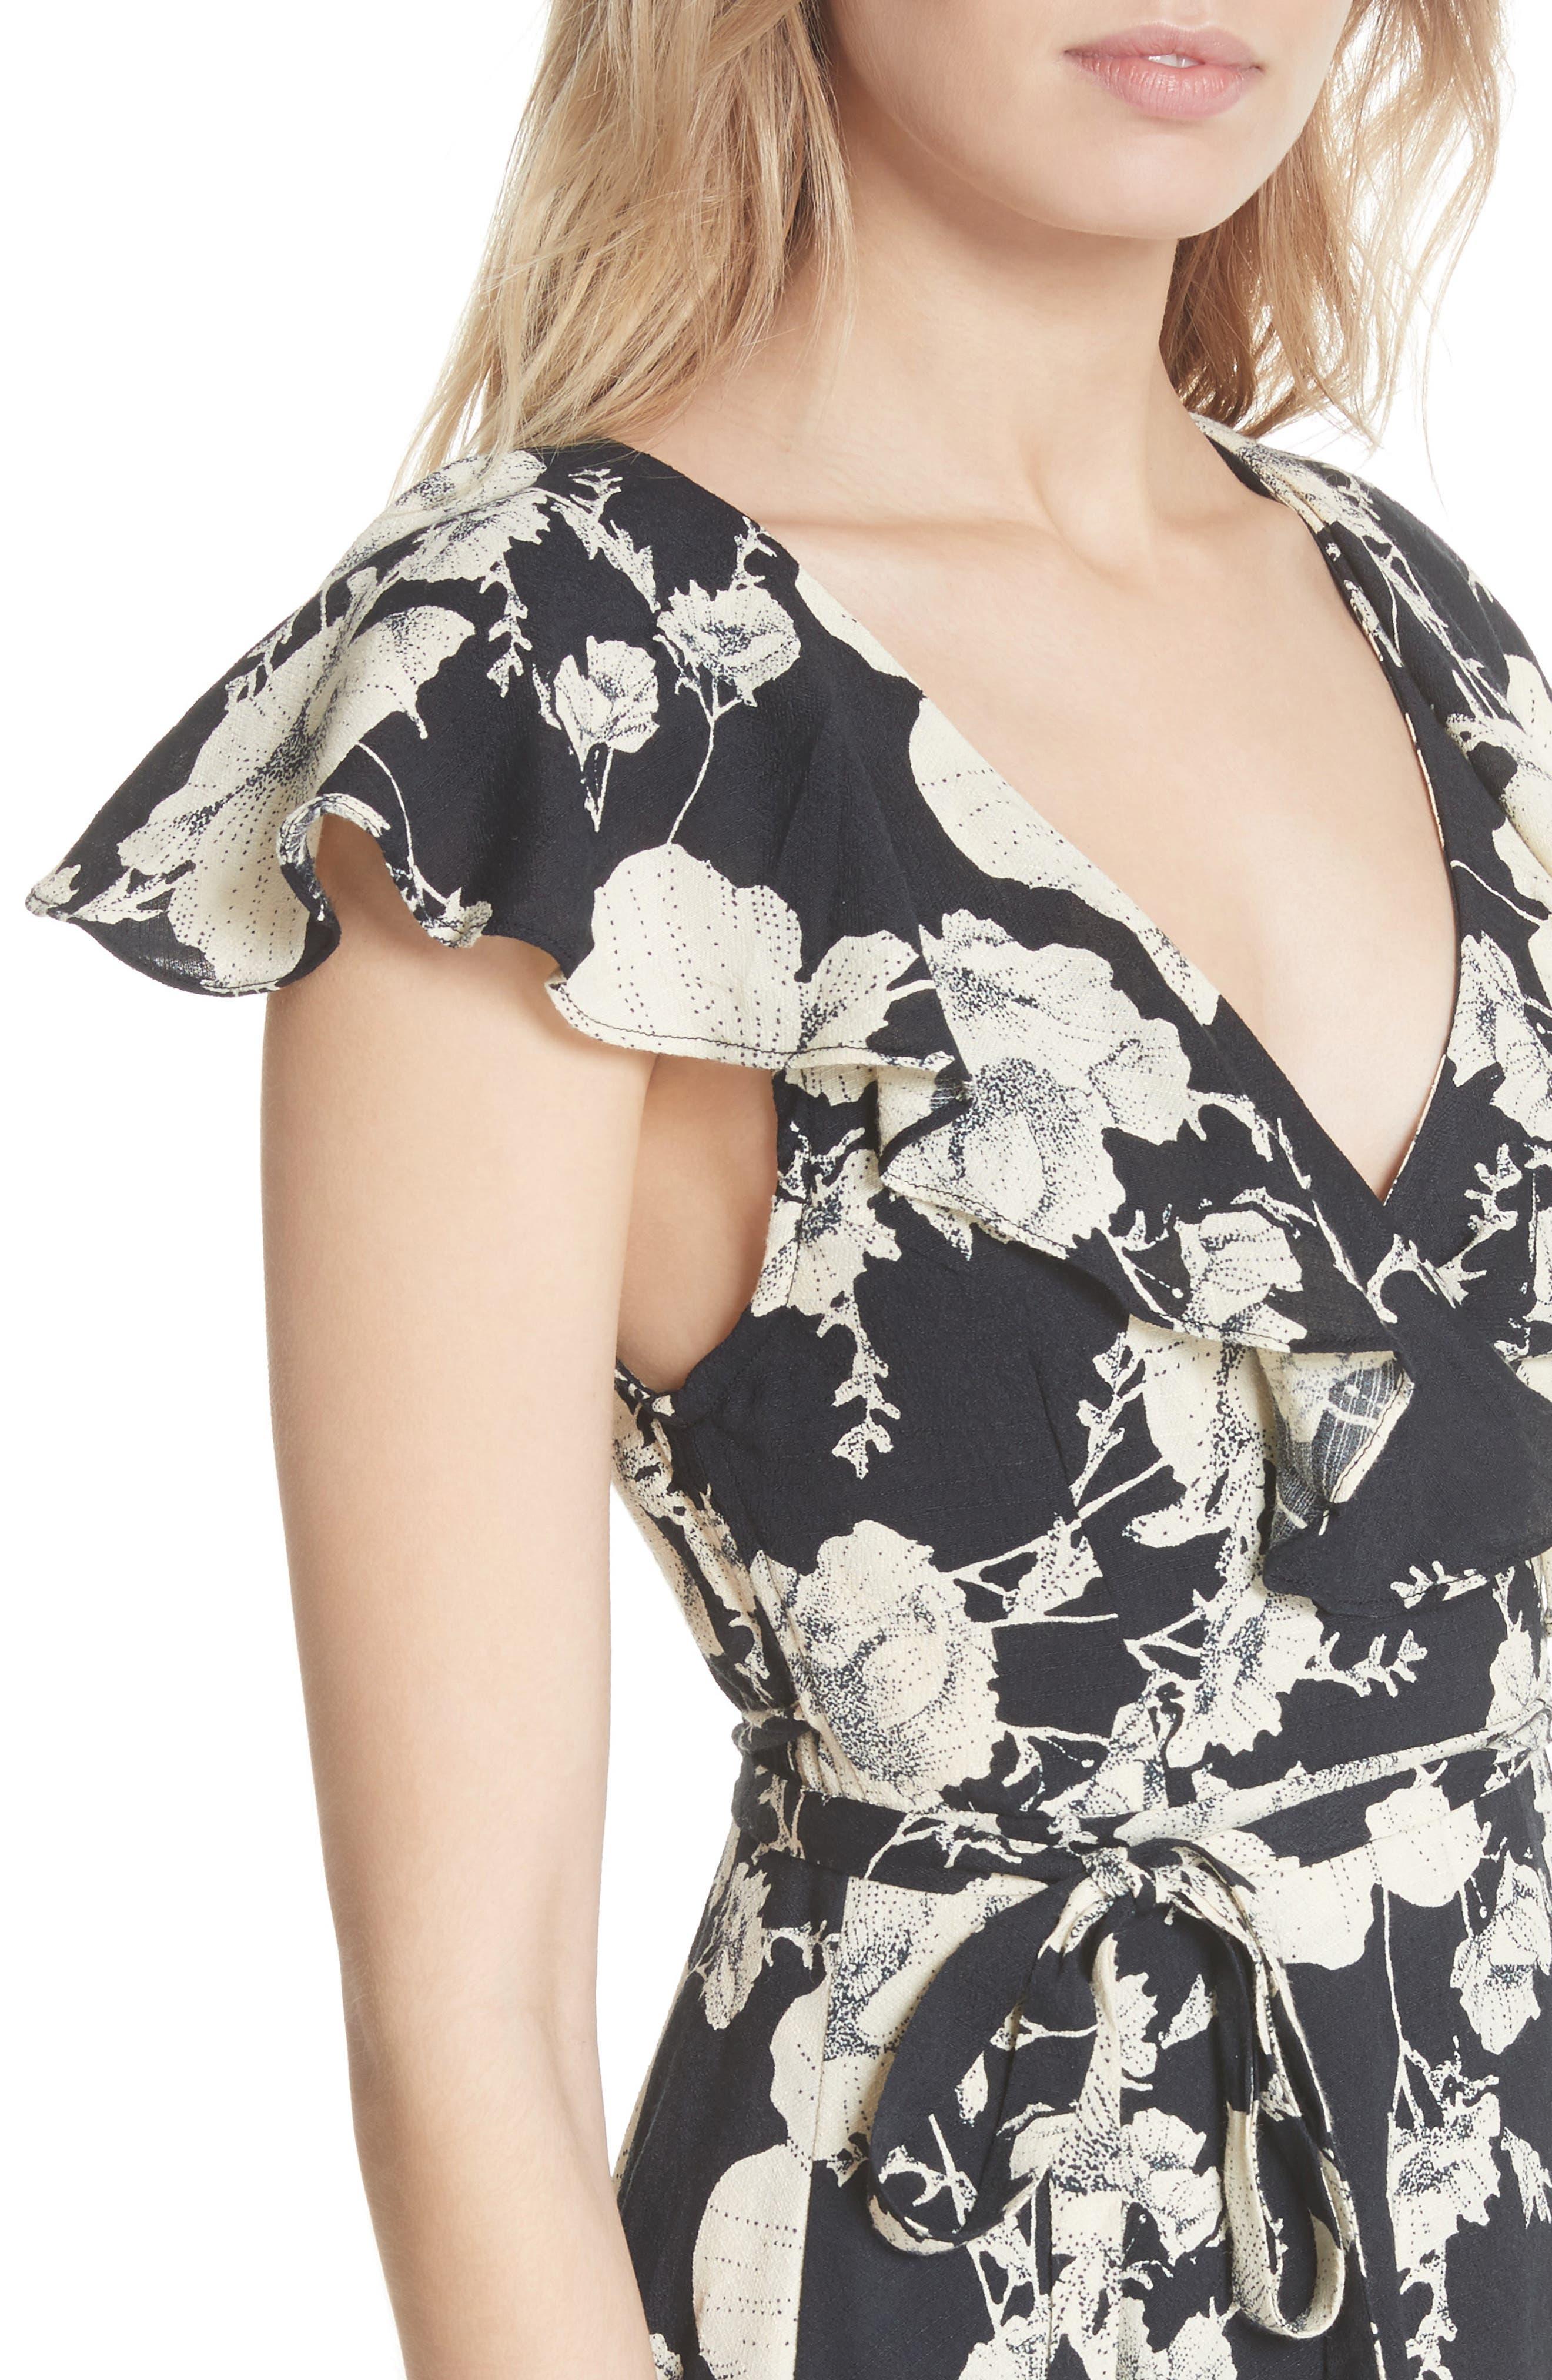 French Quarter Print Wrap Minidress,                             Alternate thumbnail 4, color,                             001